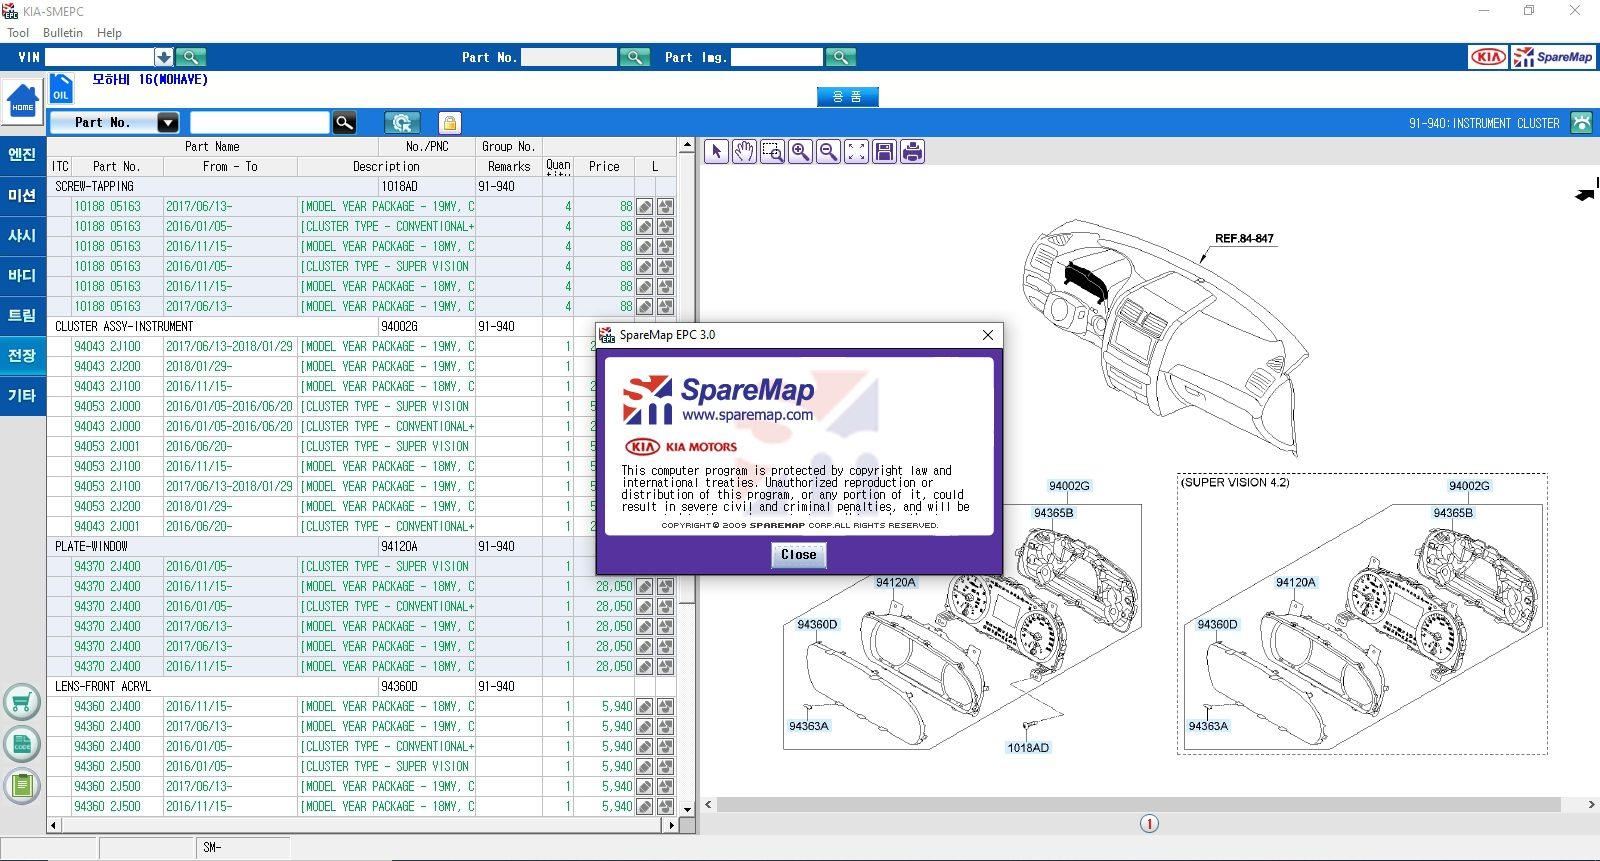 Hyundai_Kia_Korea_SM_EPC_072019_Parts_Catalog_Domestic_Market_8